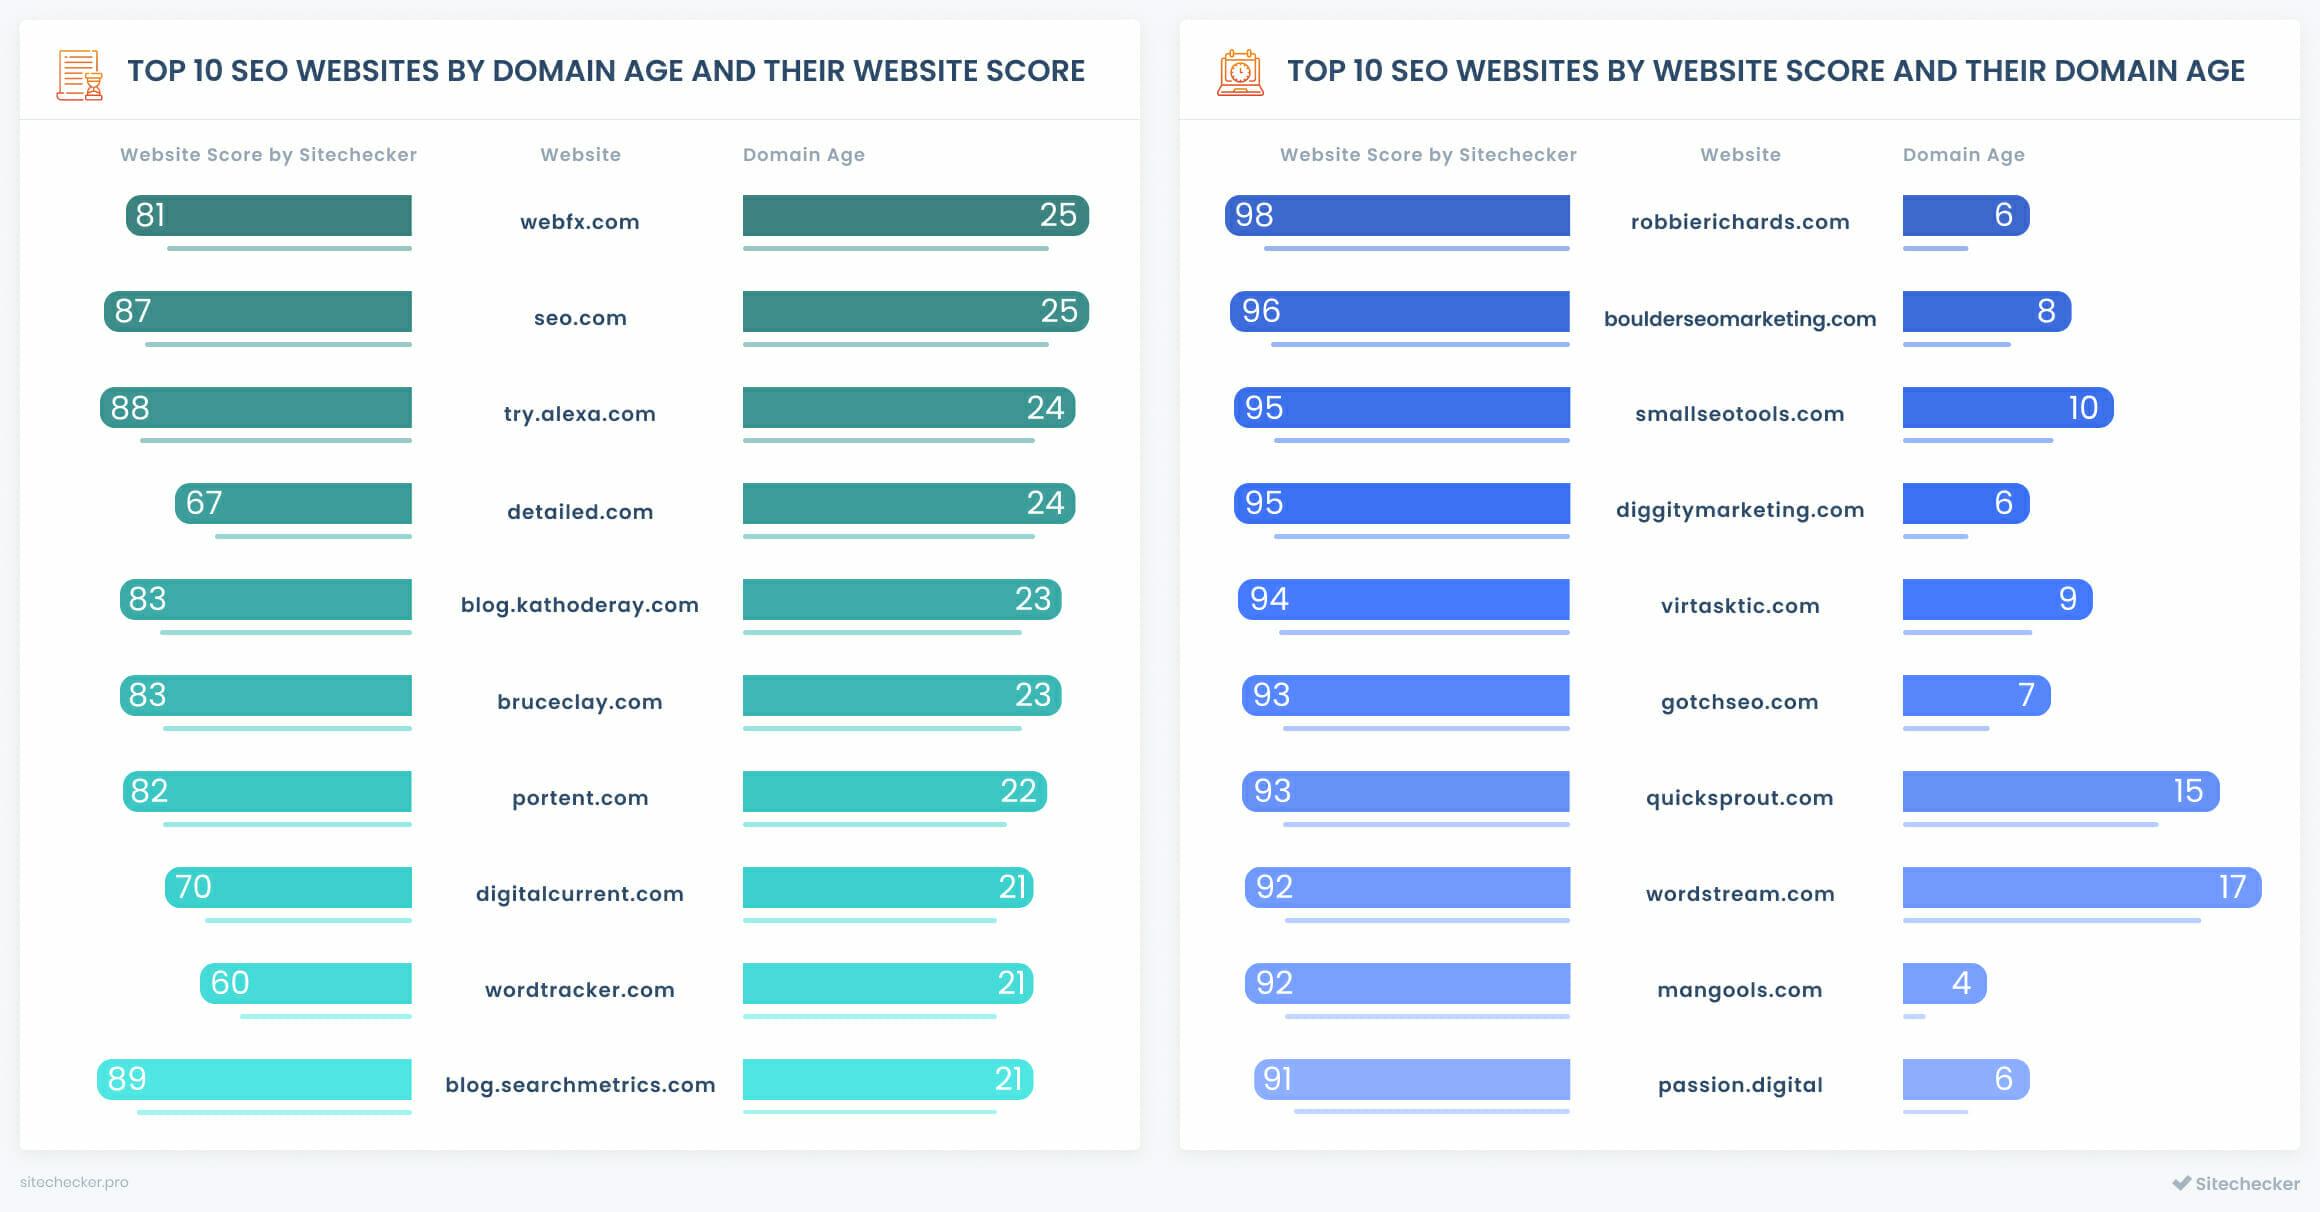 top seo companies by domain age